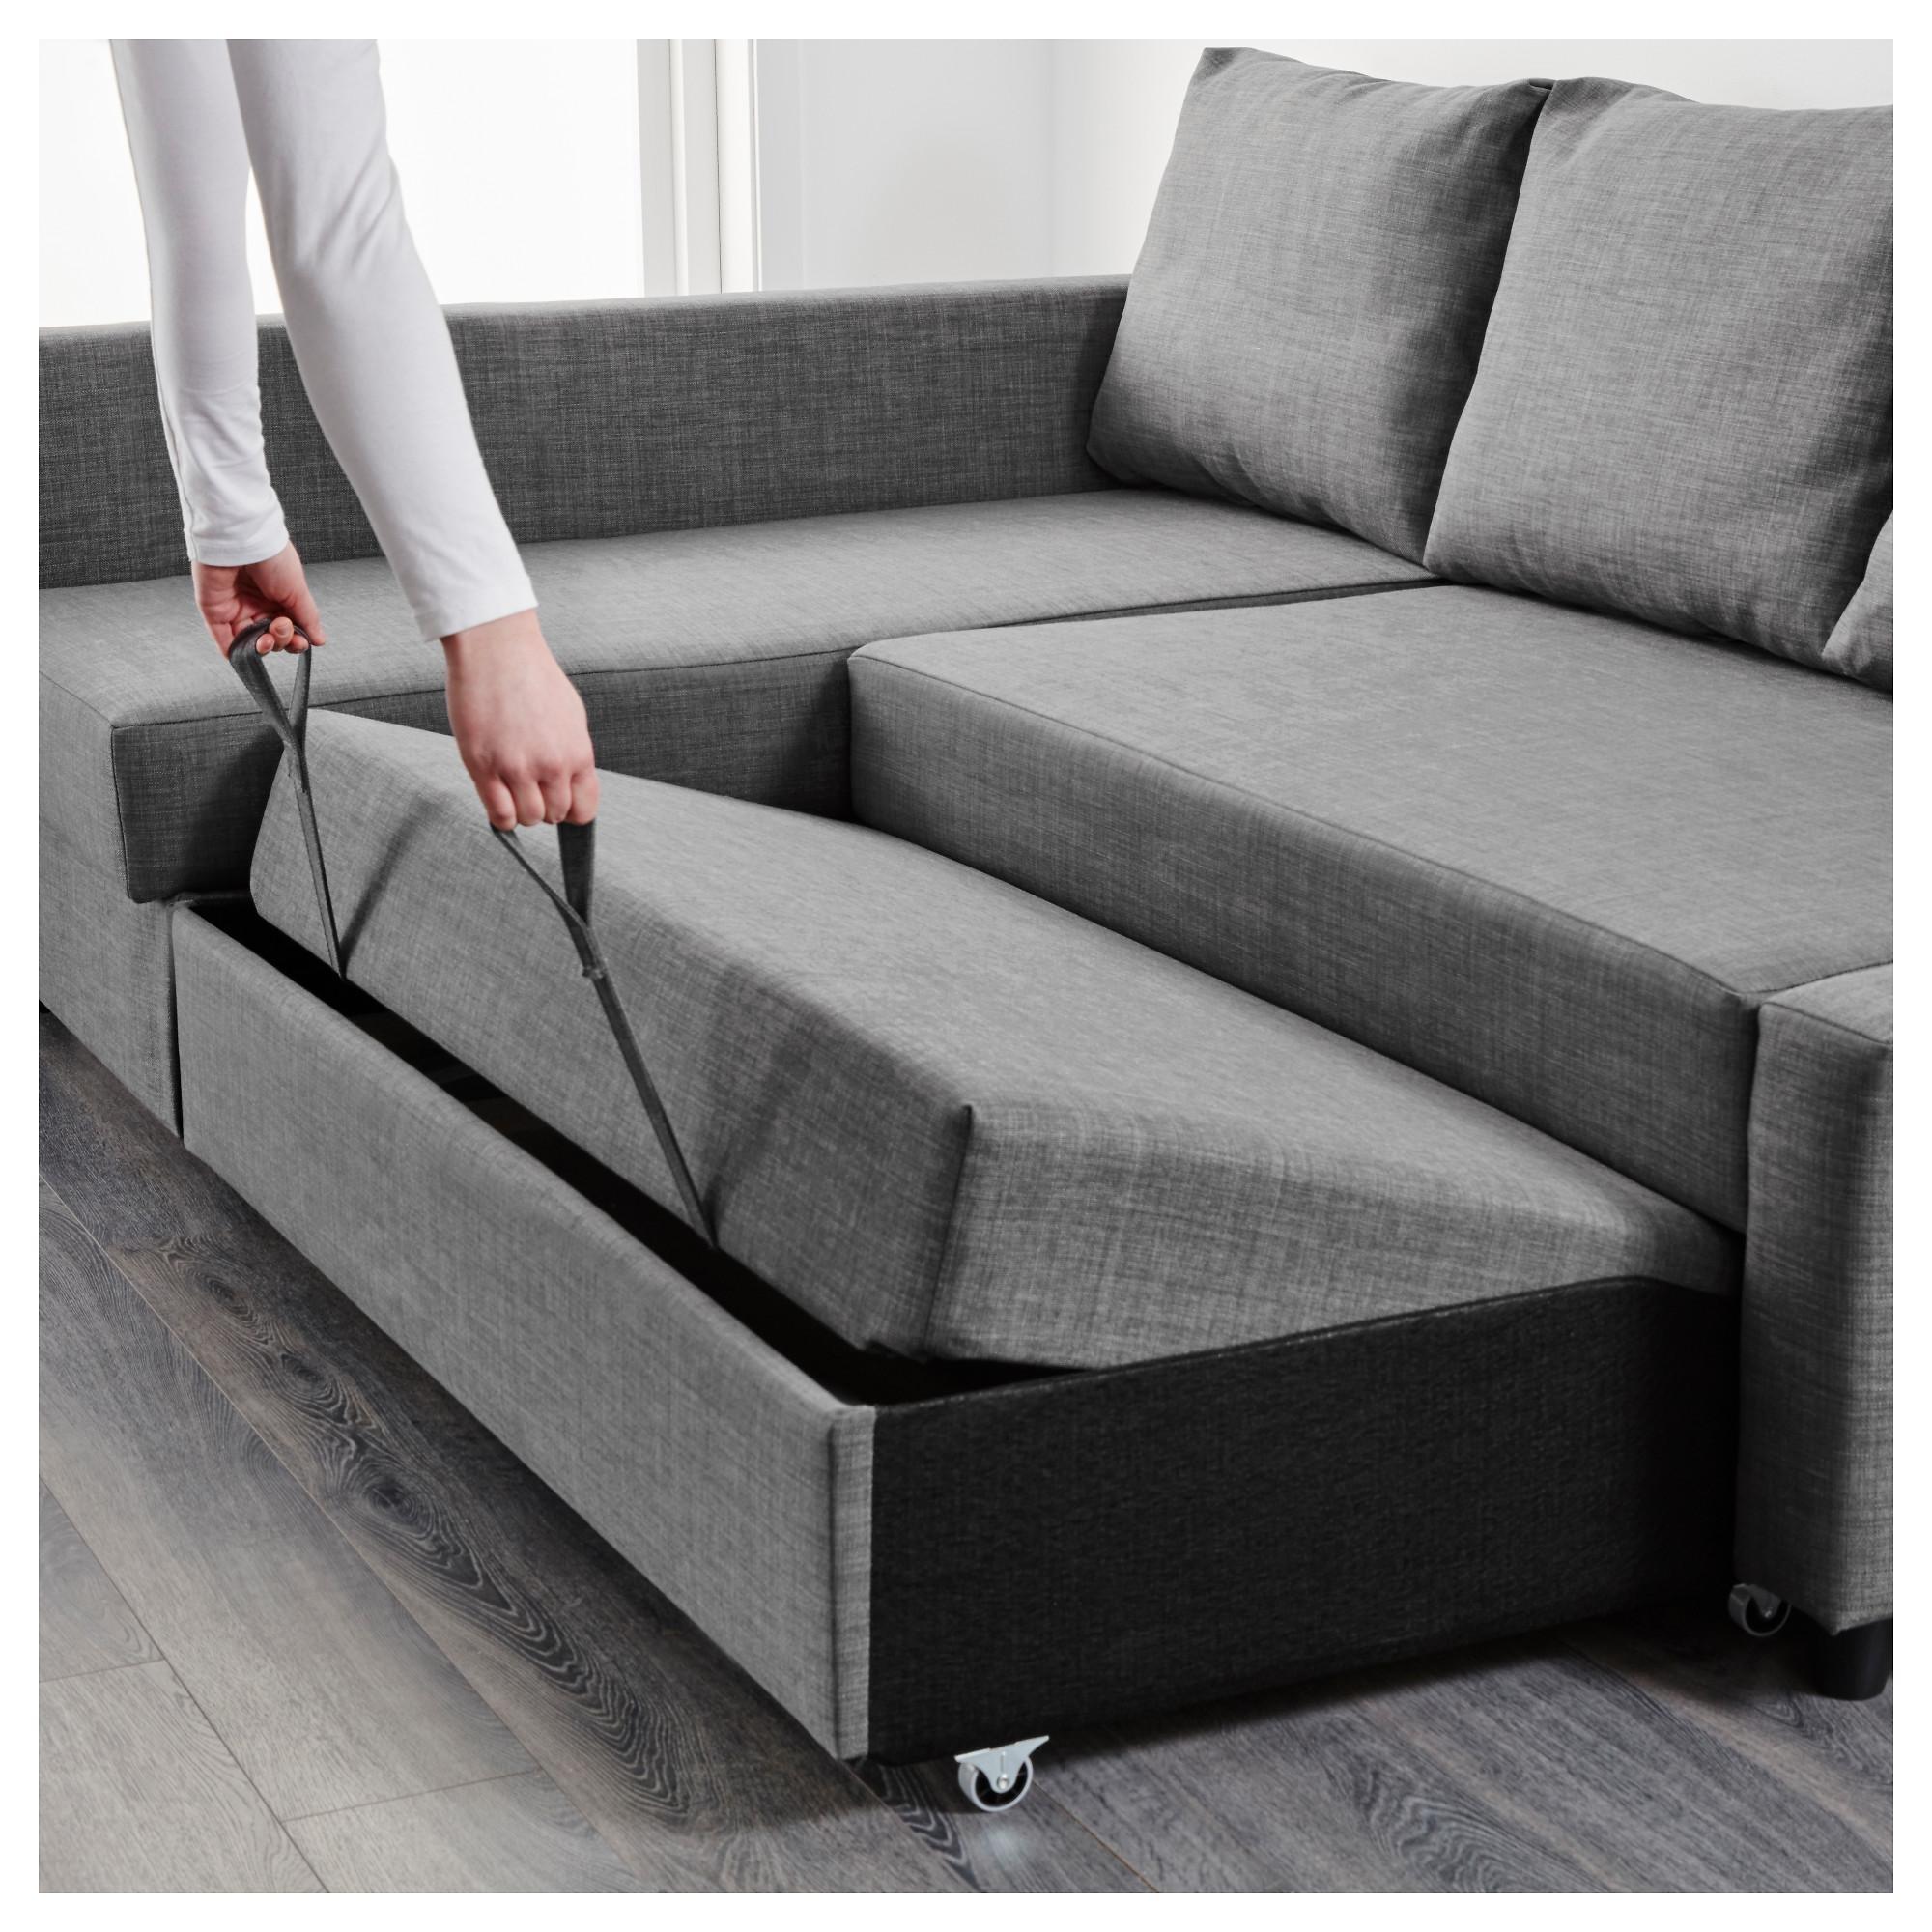 Friheten Corner Sofa Bed With Storage Skiftebo Dark Grey – Ikea Within Ikea Corner Sofa Bed With Storage (View 3 of 20)